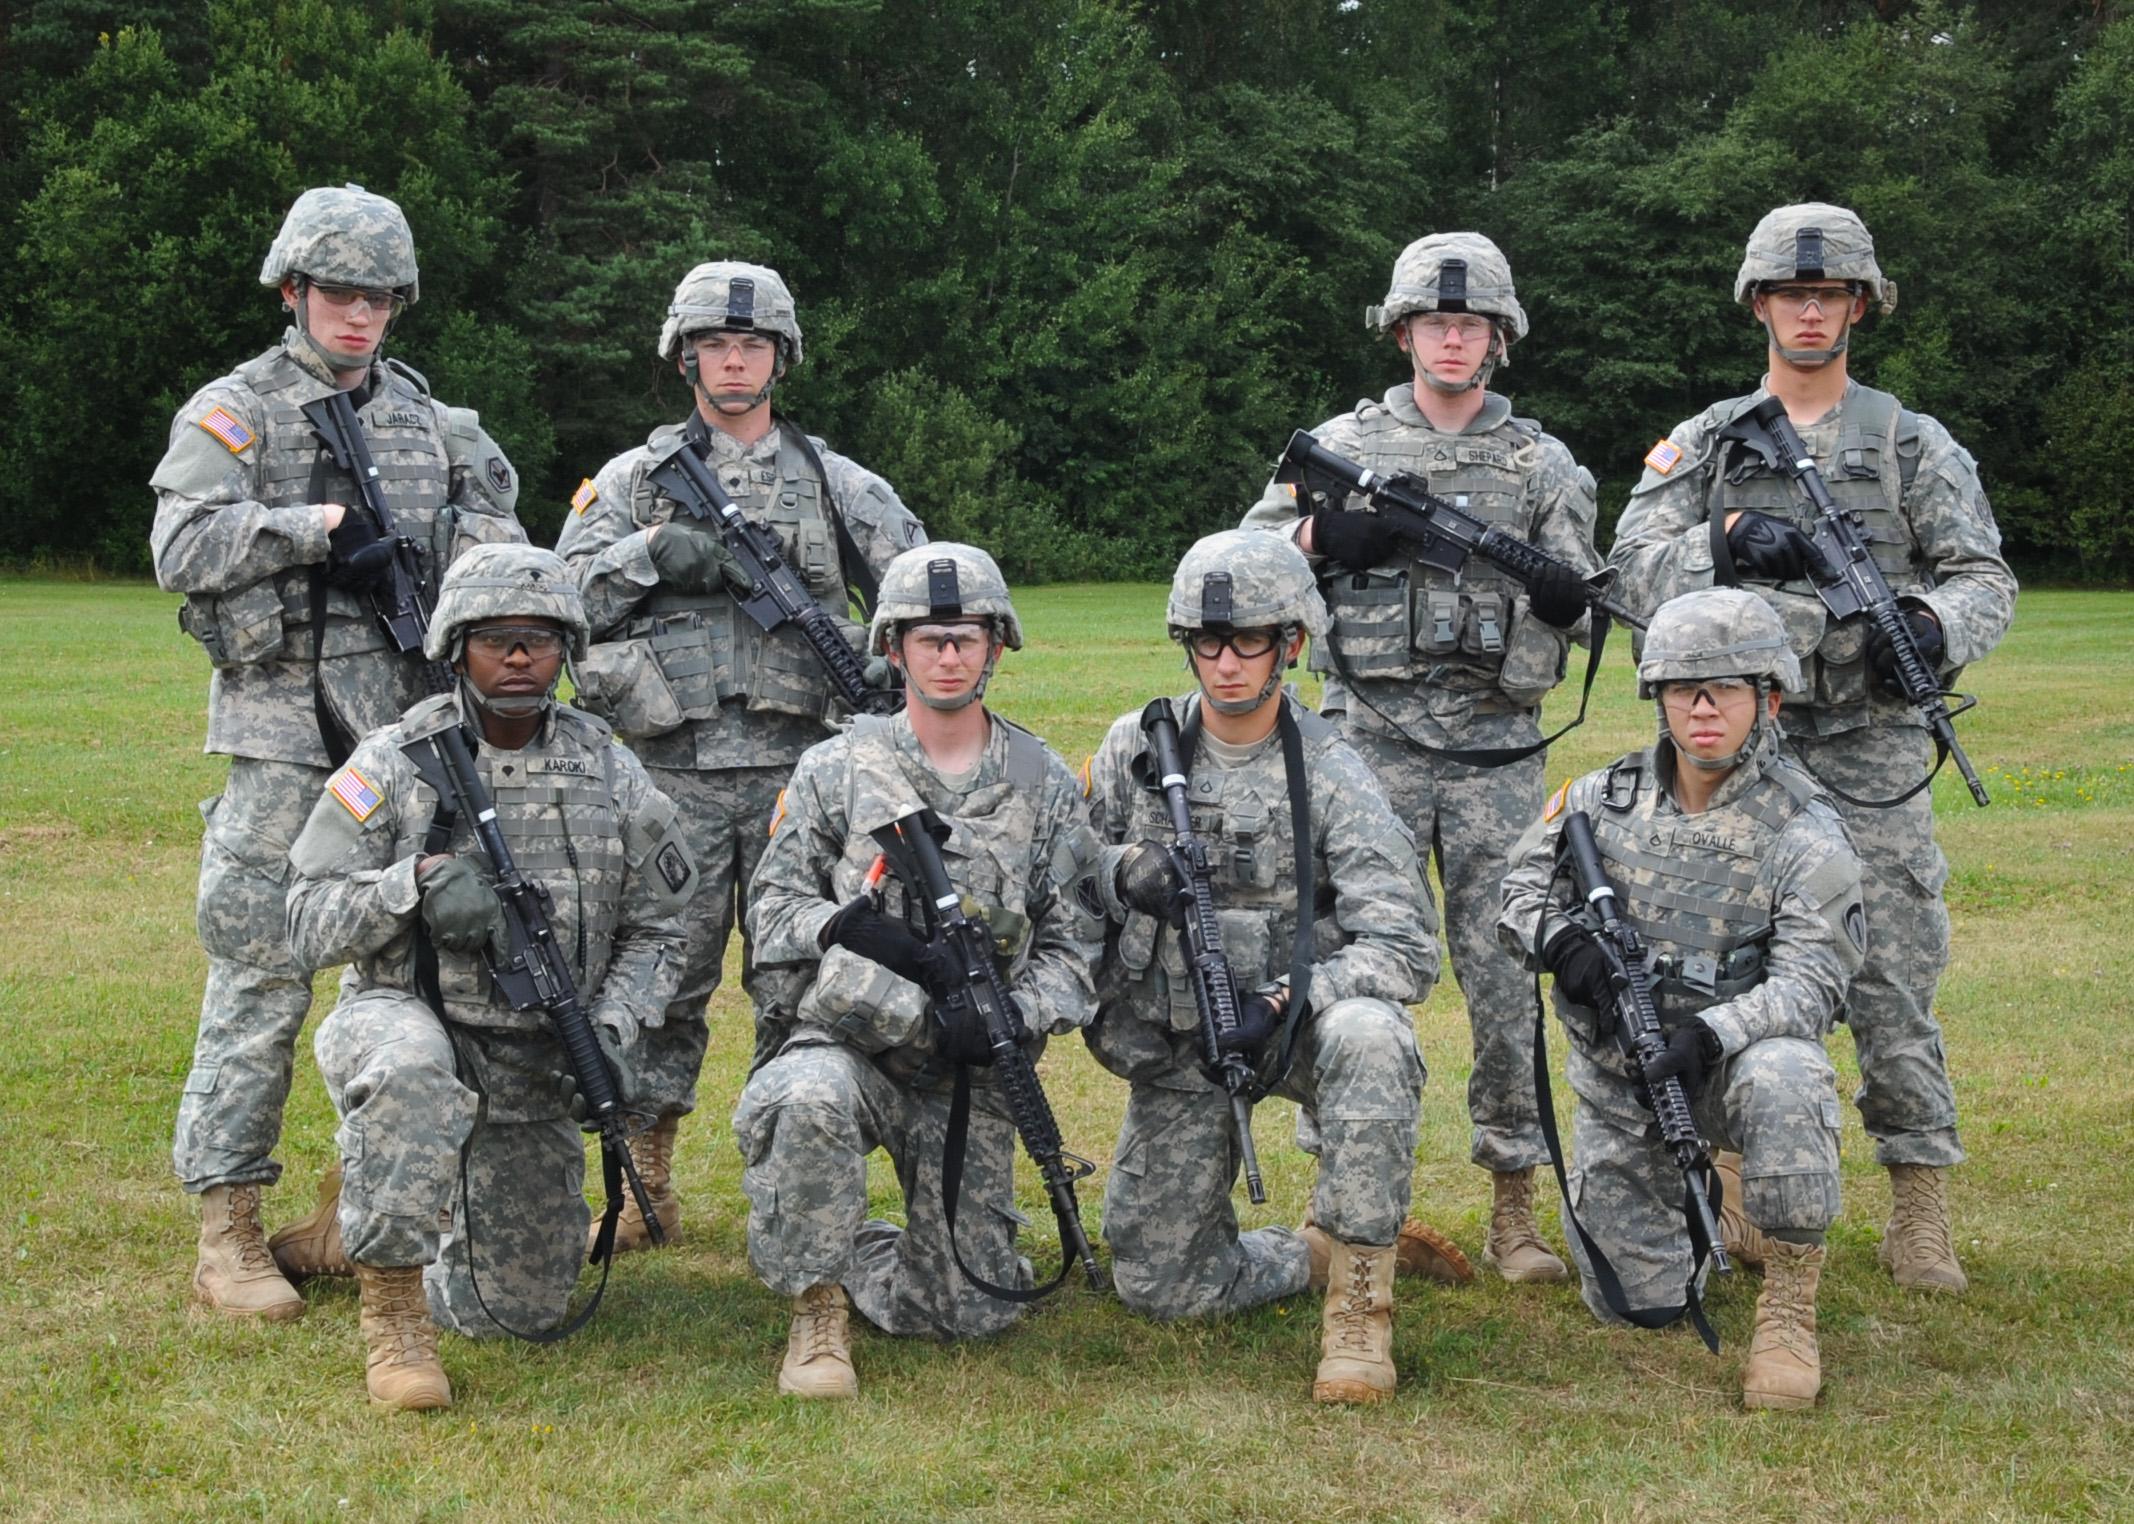 File:U.S. Army Europe's Best Warrior Soldiers (7690567456).jpg - Wikimedia Commons